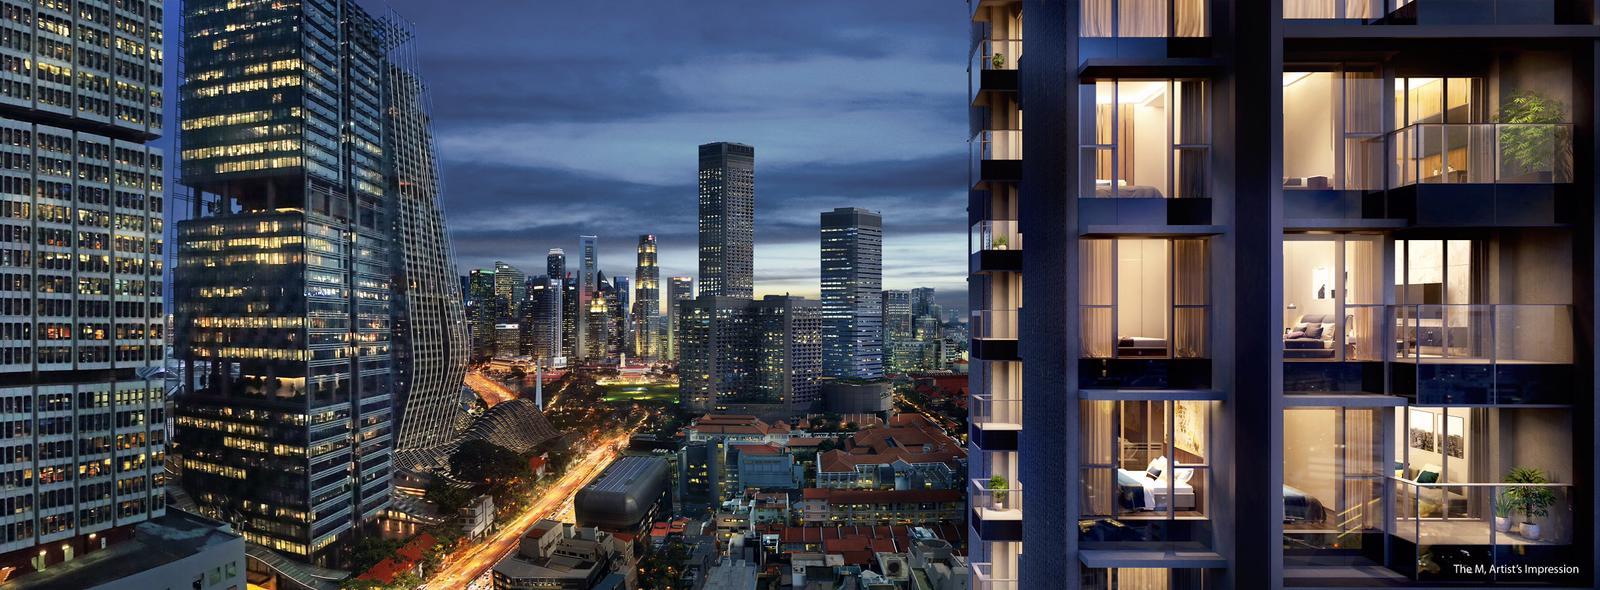 The-M-condo-bugis-mrt-singapore